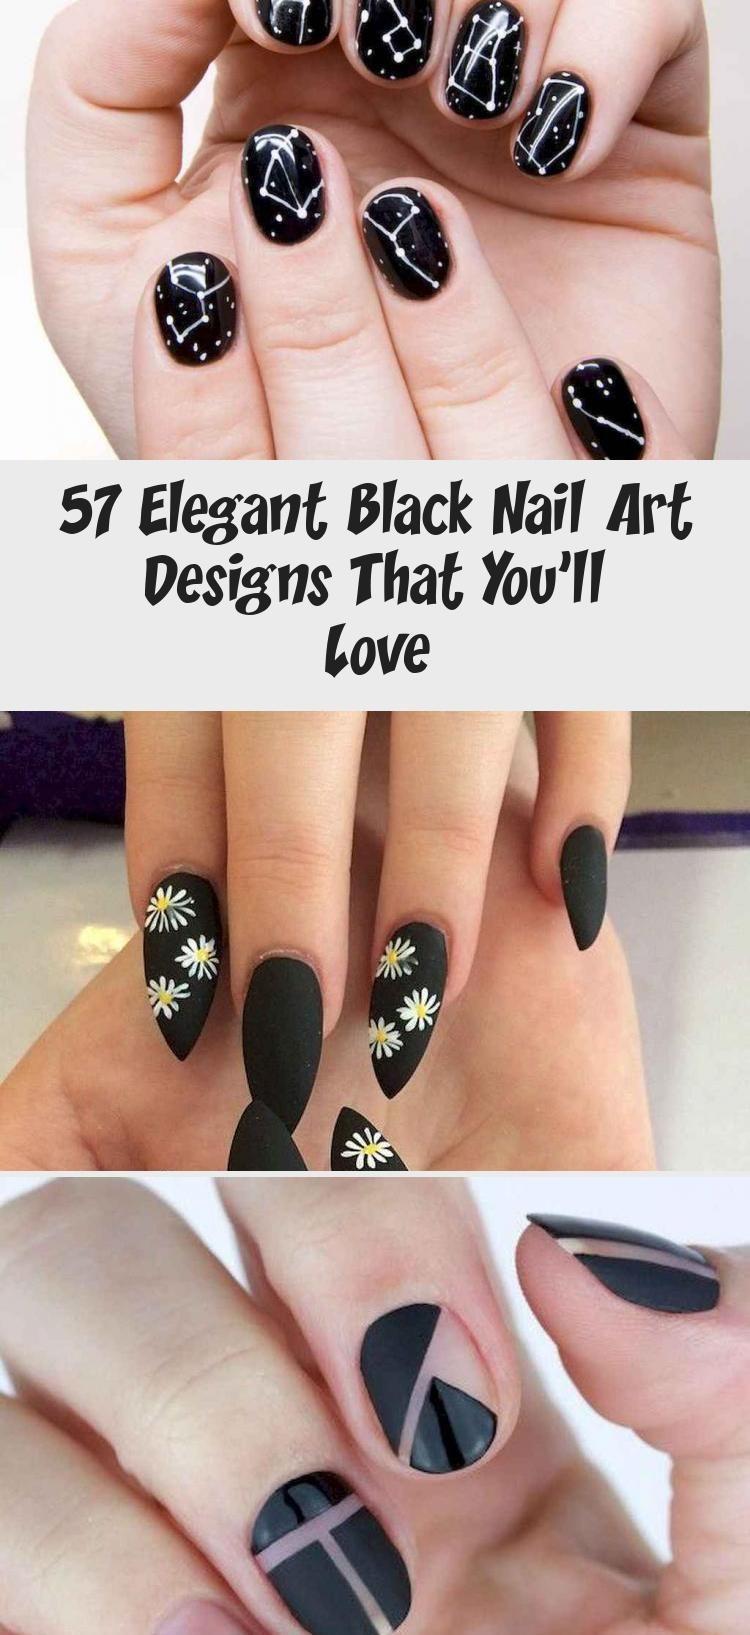 Photo of 57 Elegant Black Nail Art Designs That You'll Love – Nail Art